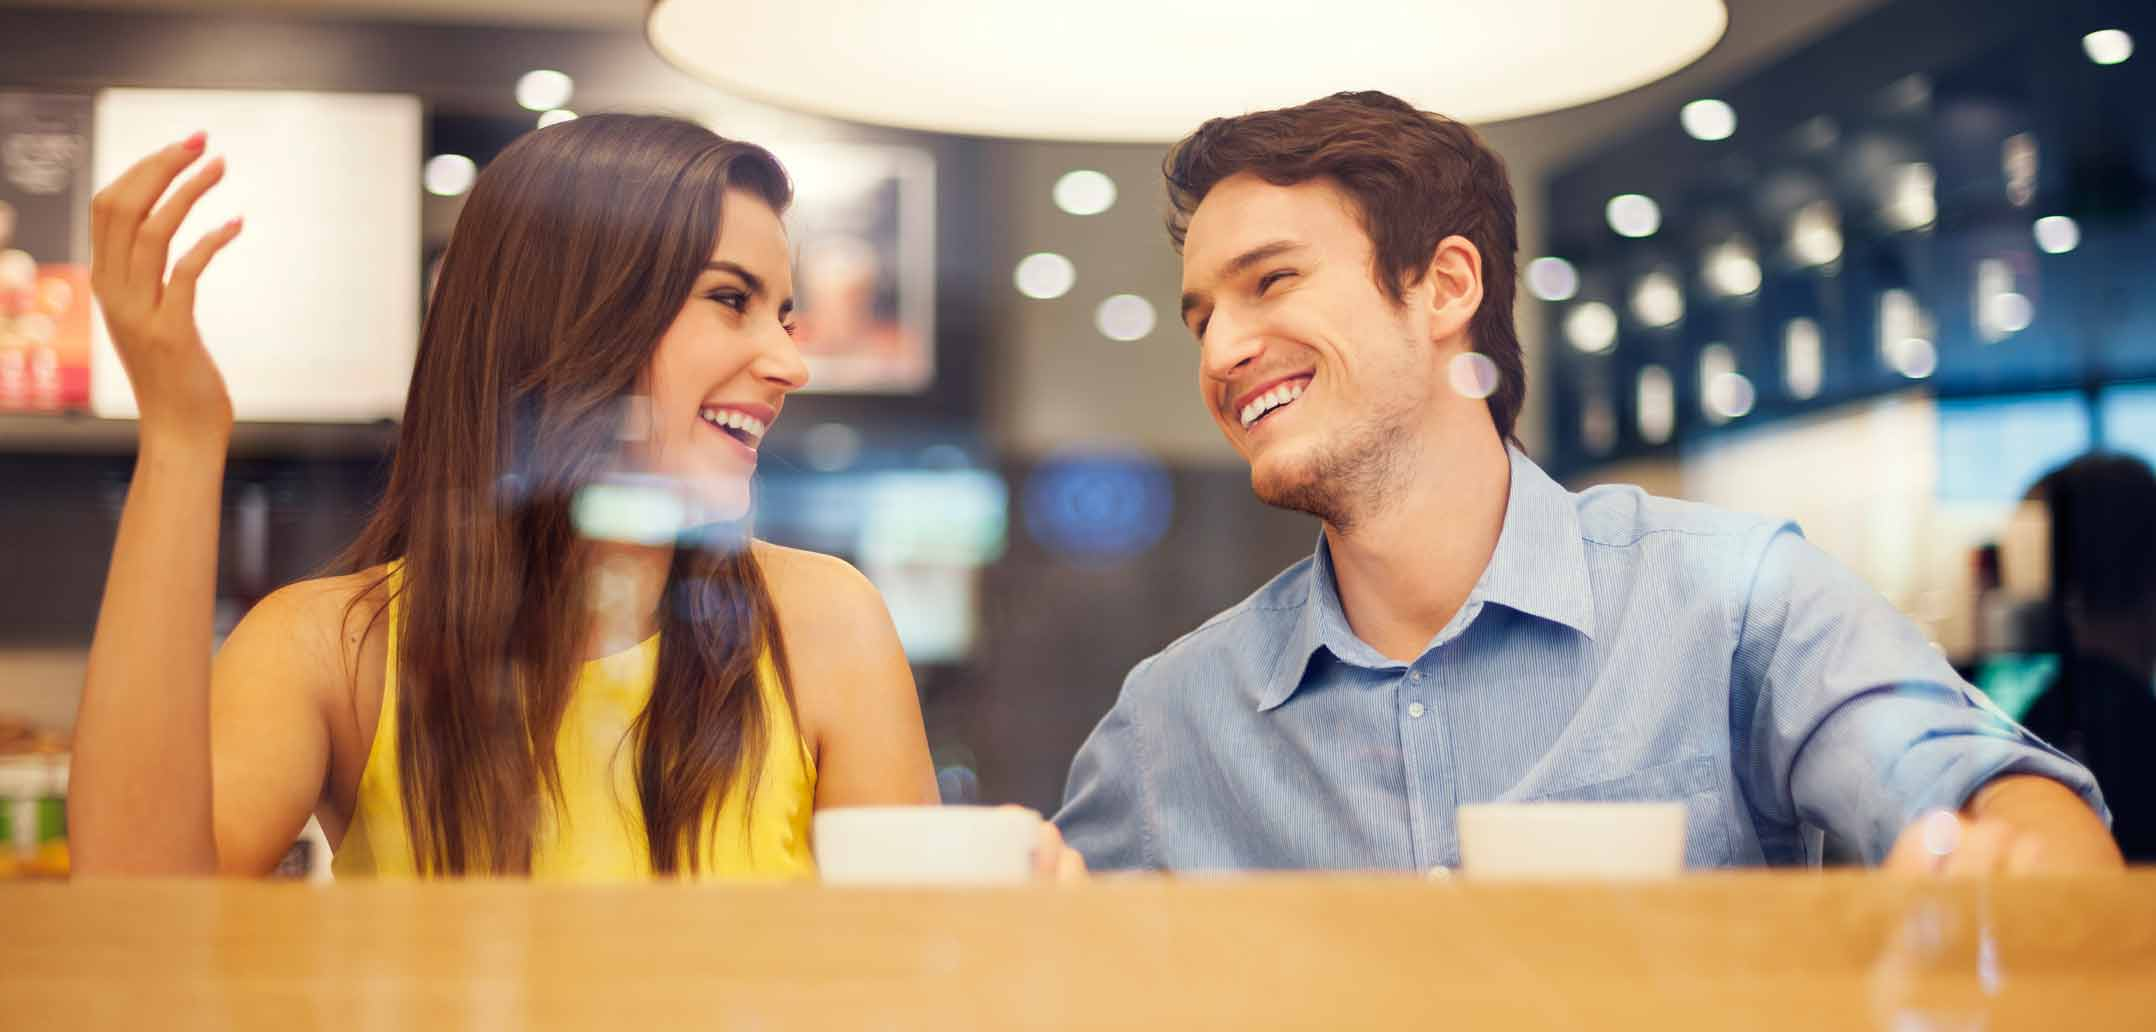 frau flirtet frau an männliche initiative erwünscht doch jeder dritte traut sich nicht